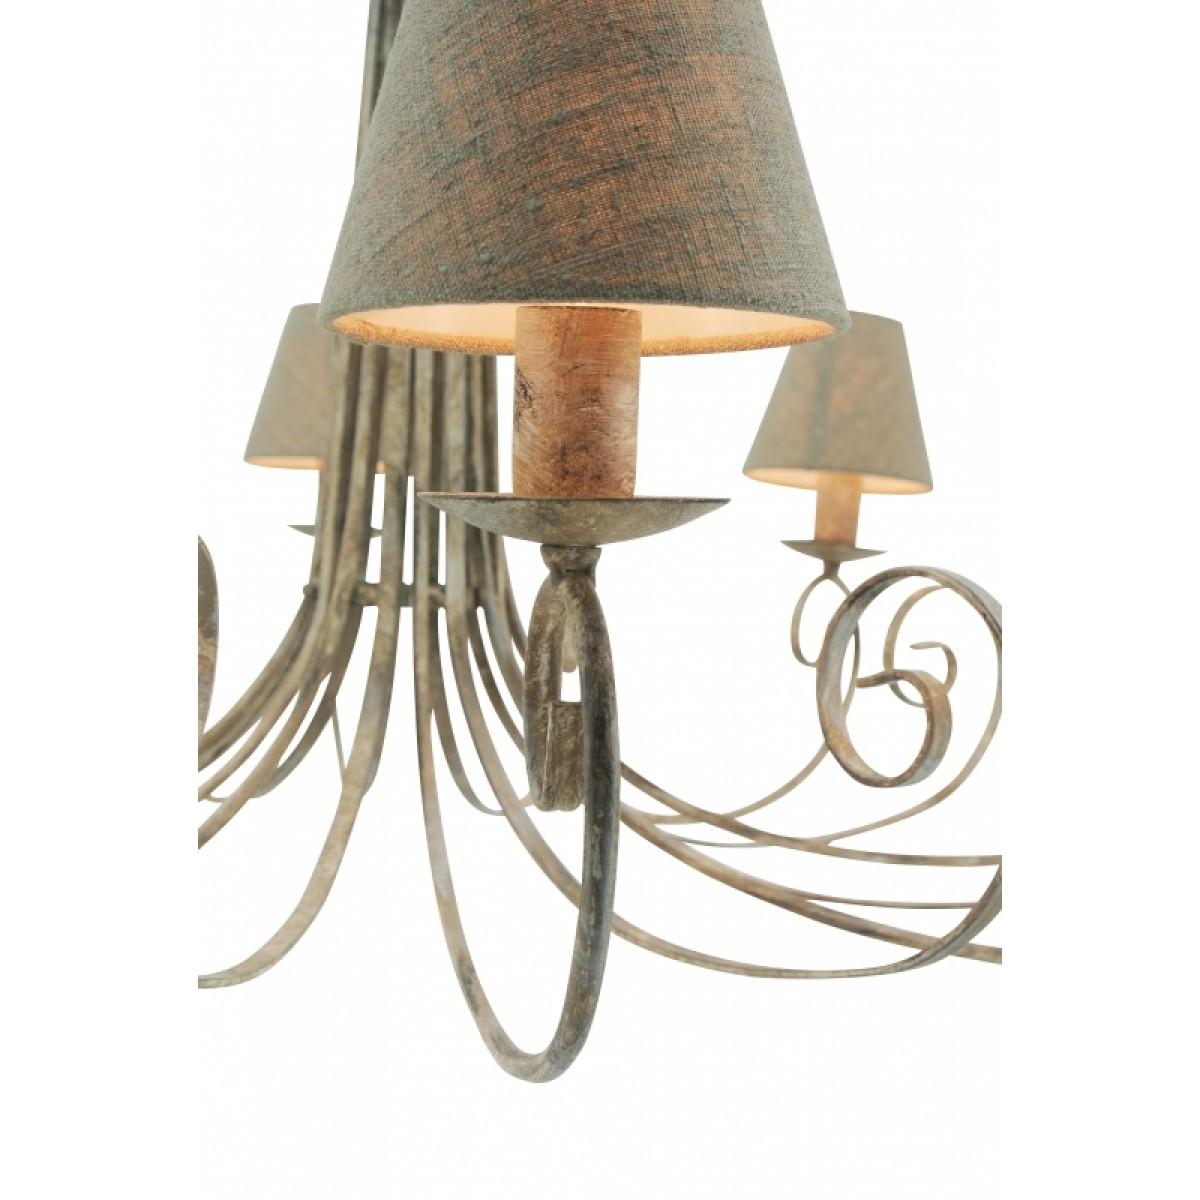 kronleuchter grau creme landhaus 5 armig h ngeleuchte im landhausstil durchmesser 60 cm. Black Bedroom Furniture Sets. Home Design Ideas